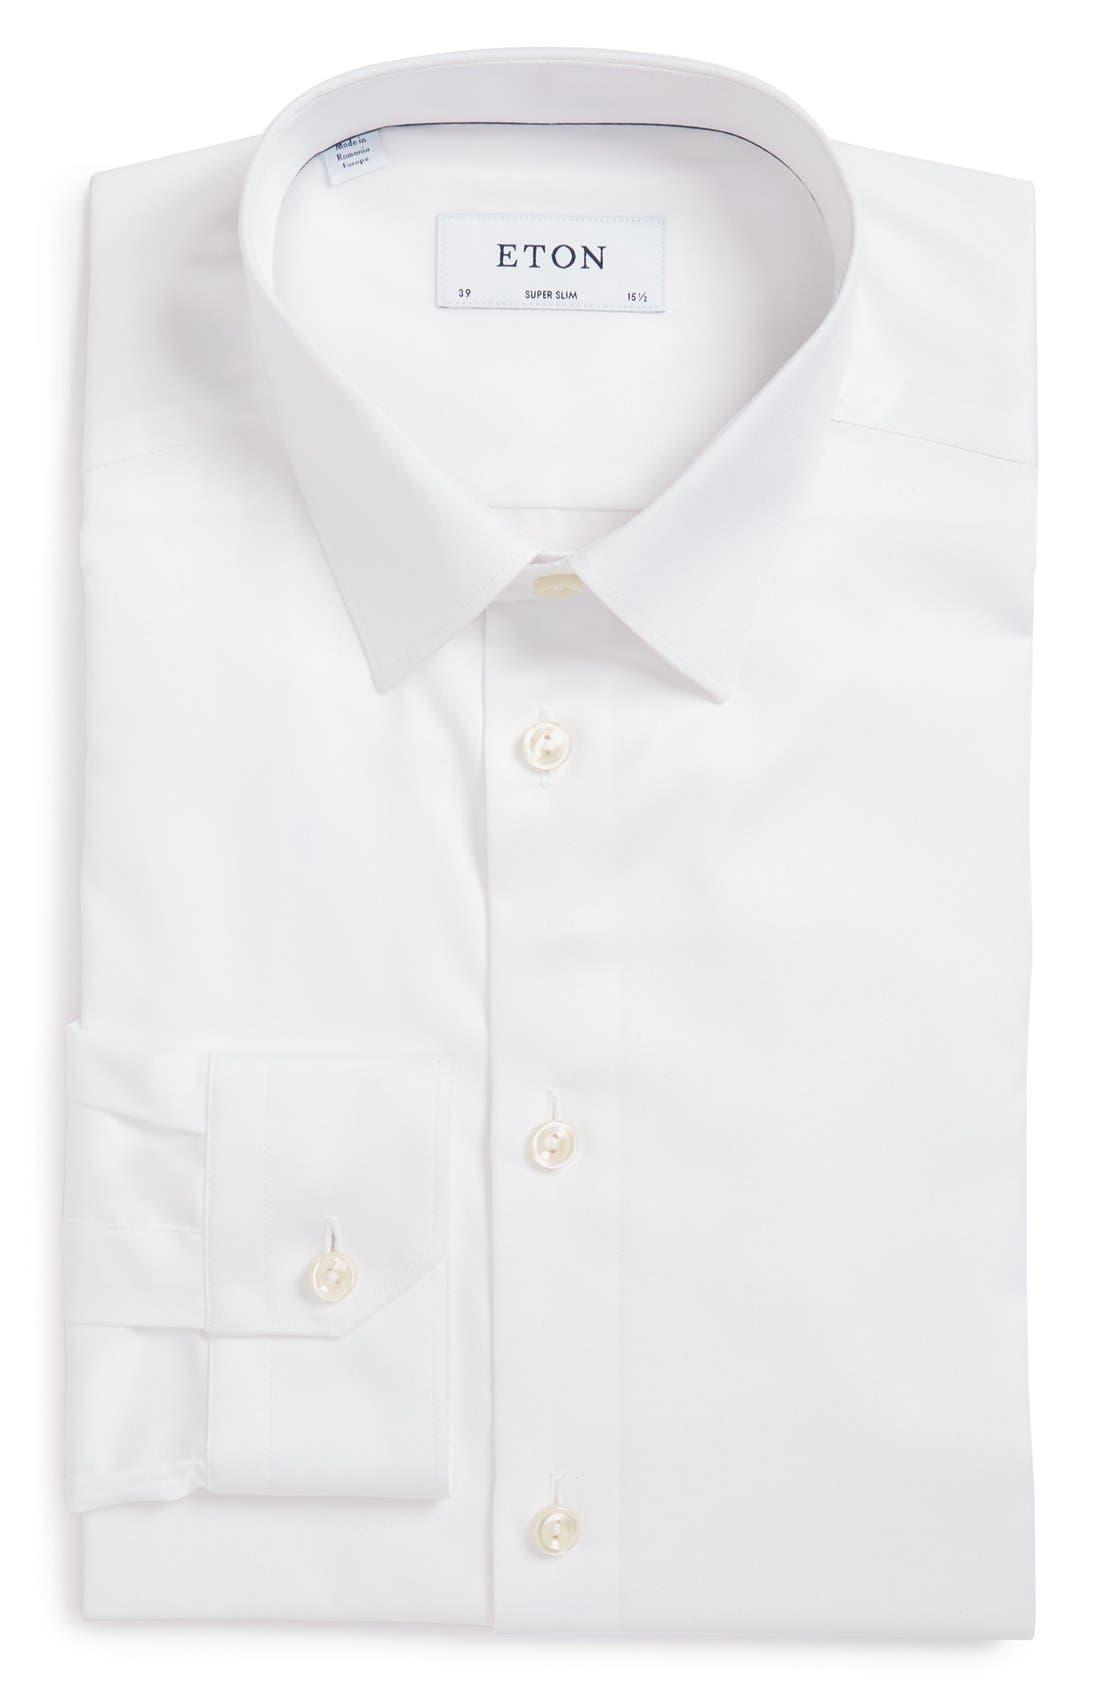 Main Image - Eton Super Slim Fit Twill Dress Shirt